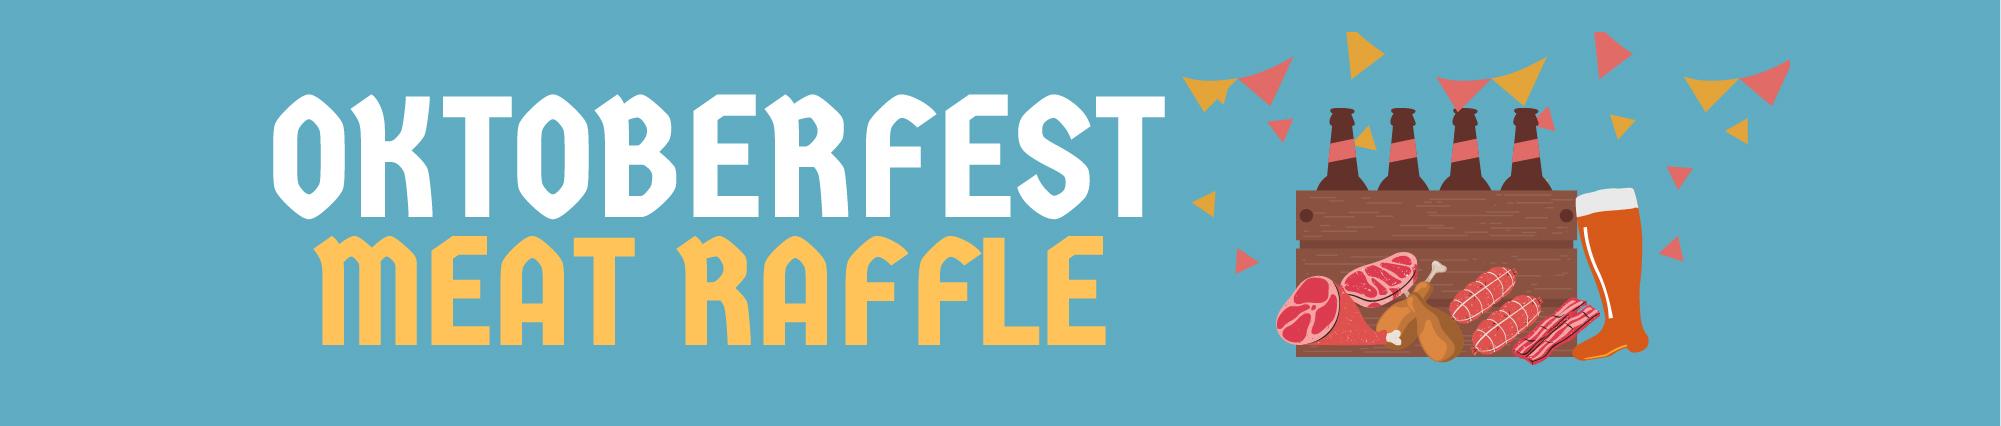 Oktoberfest Meat raffle graphic